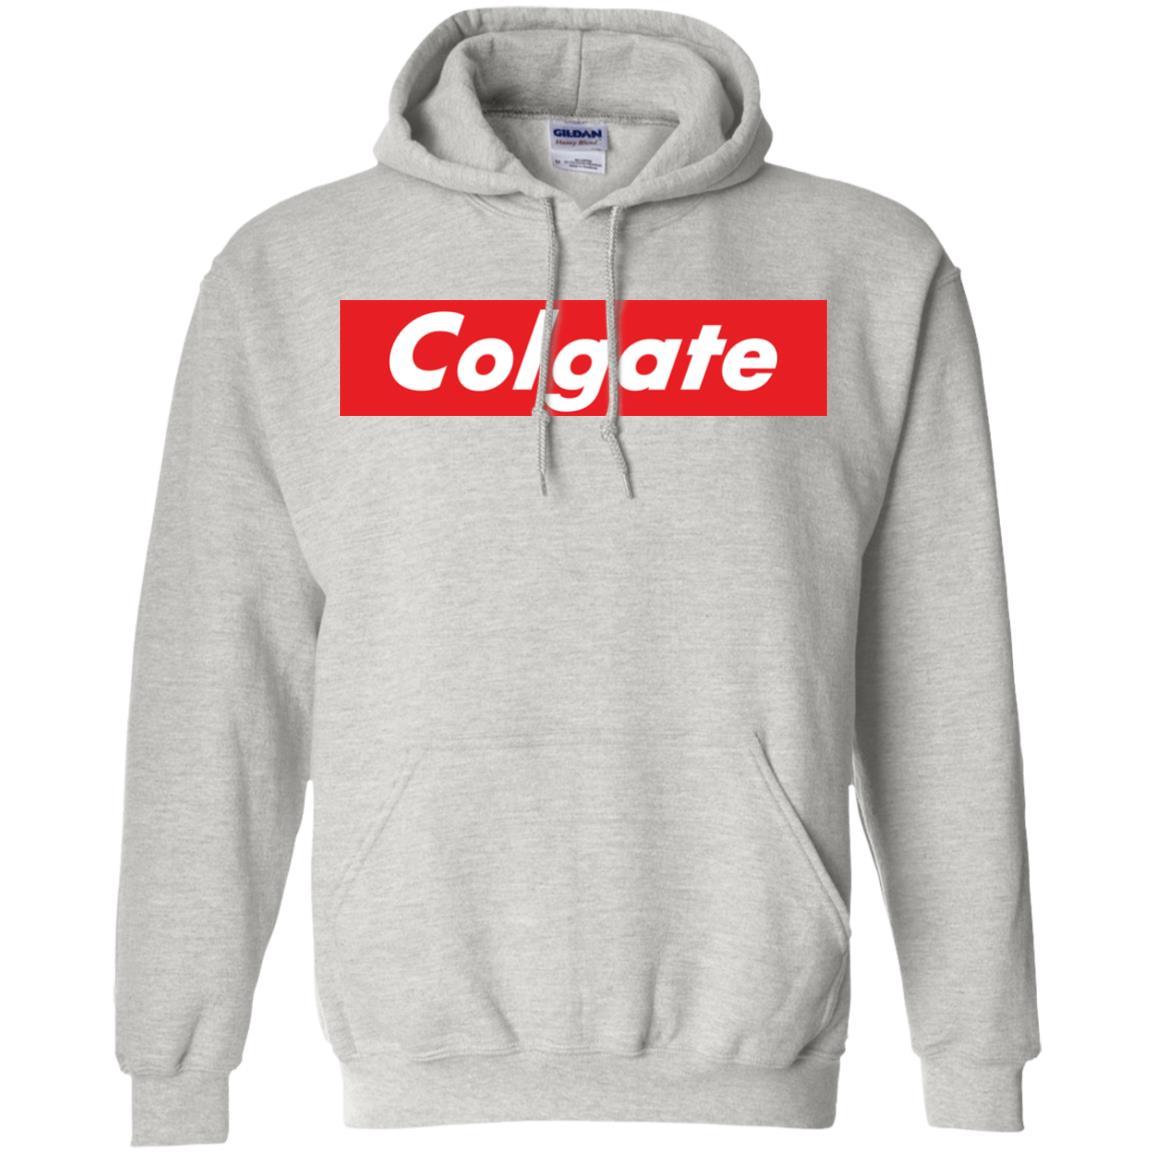 image 992px Supreme Colgate Shirt, Hoodies, Tank